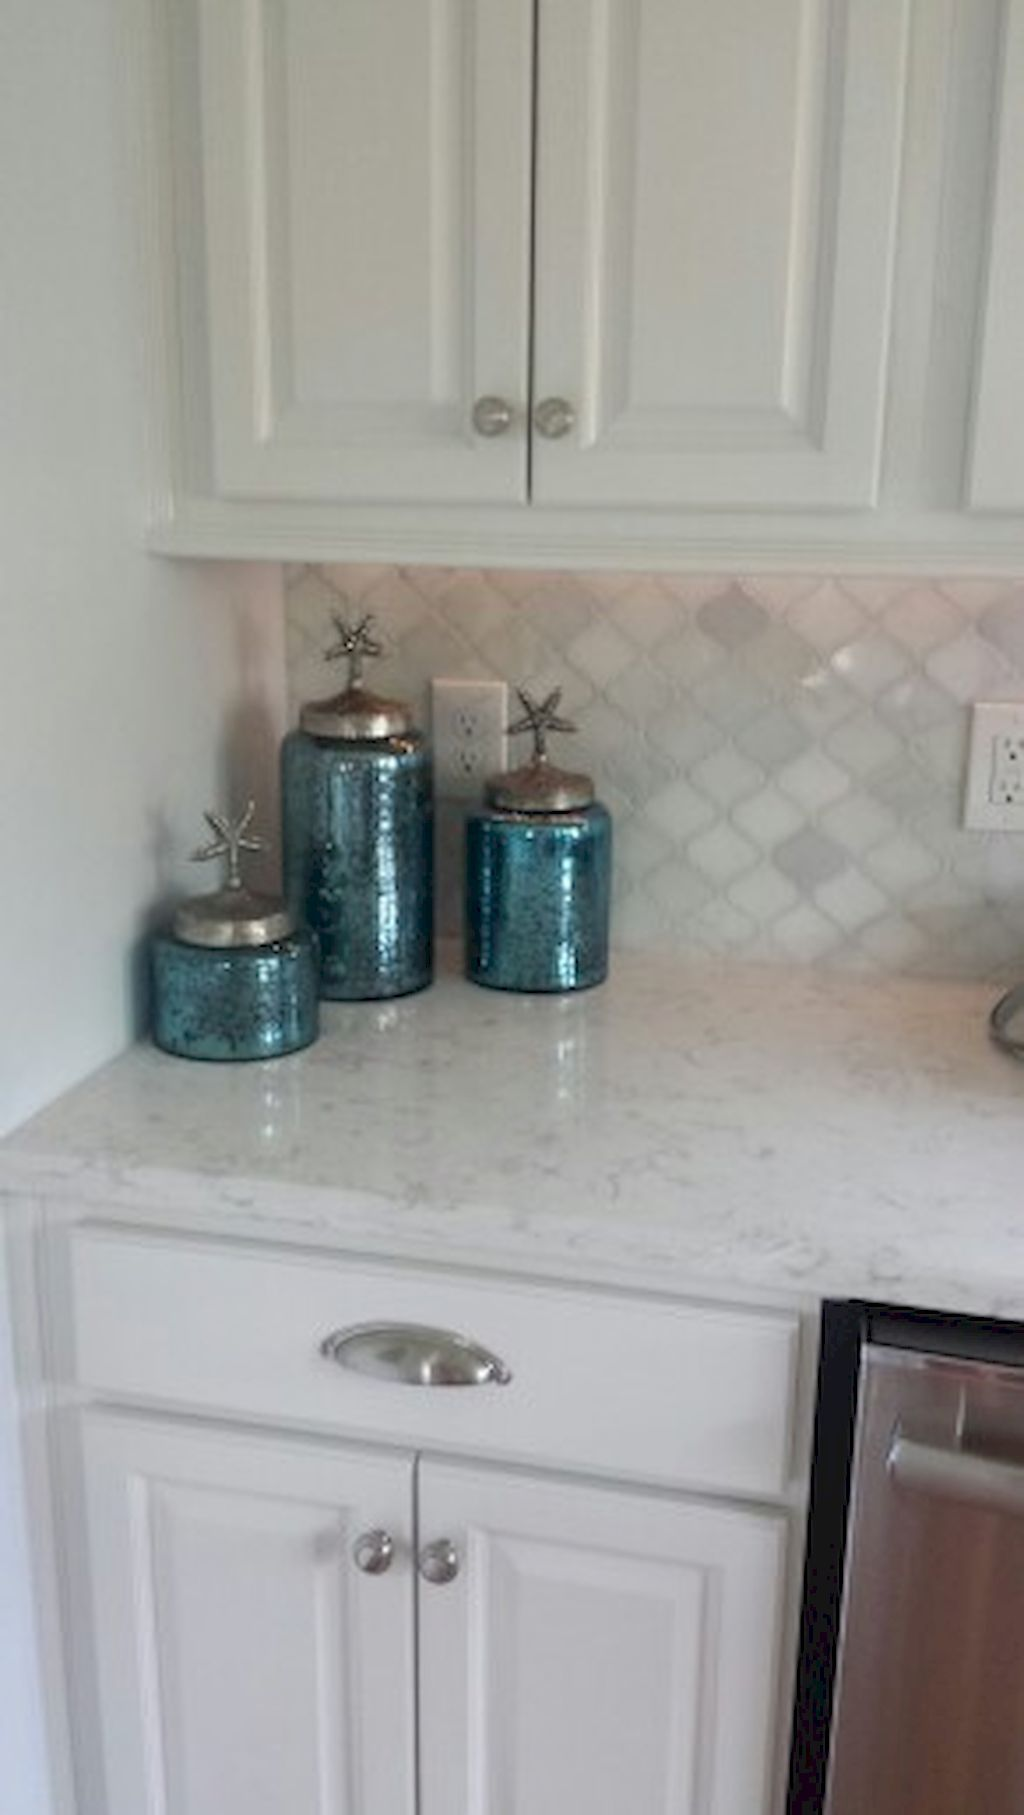 20 Recommended Small Kitchen Island Ideas On A Budget Kitchen Backsplash Designs Kitchen Tiles Backsplash Kitchen Marble